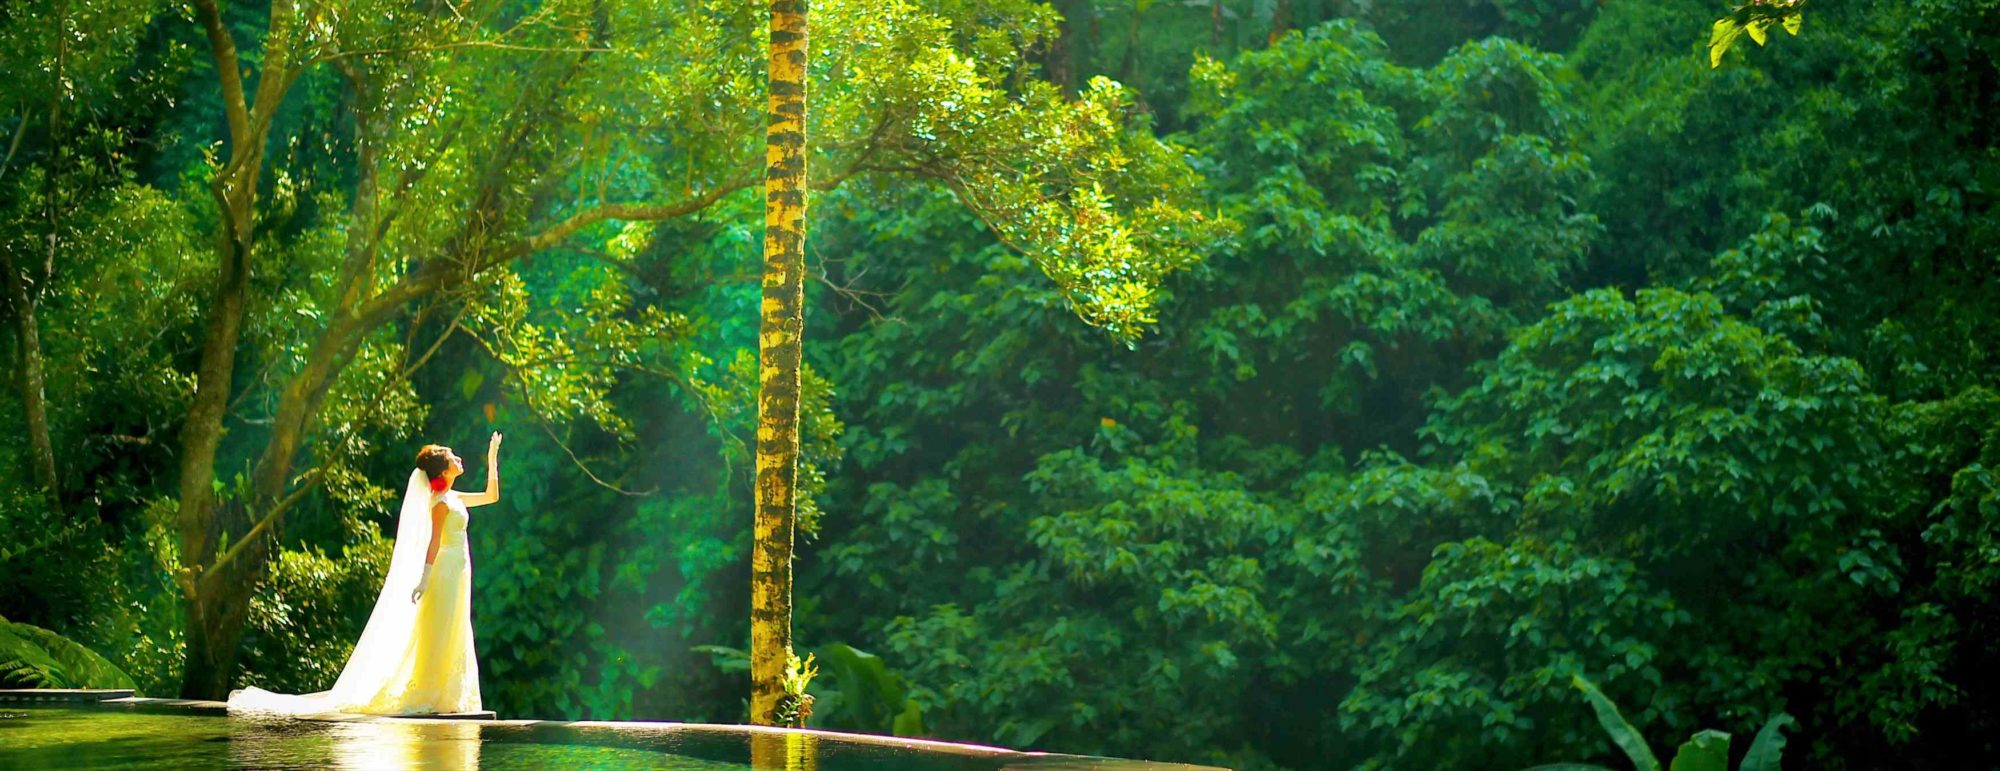 Maya Ubud Resort<br /> ~マヤ・ウブド・リゾート